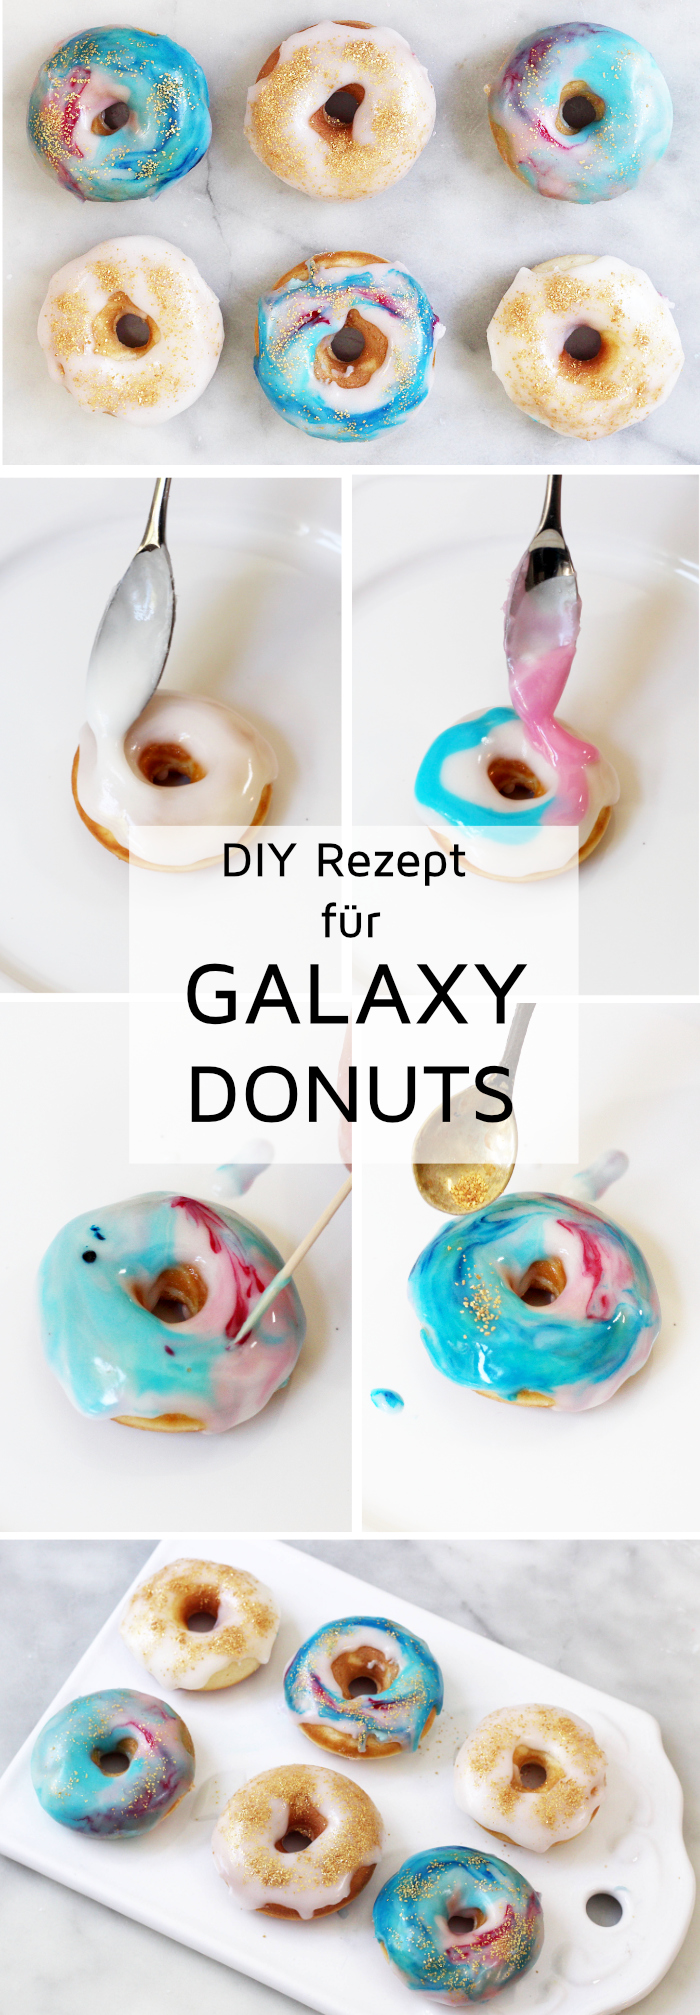 DIY-Rezept-fuer-Galaxy-Donuts